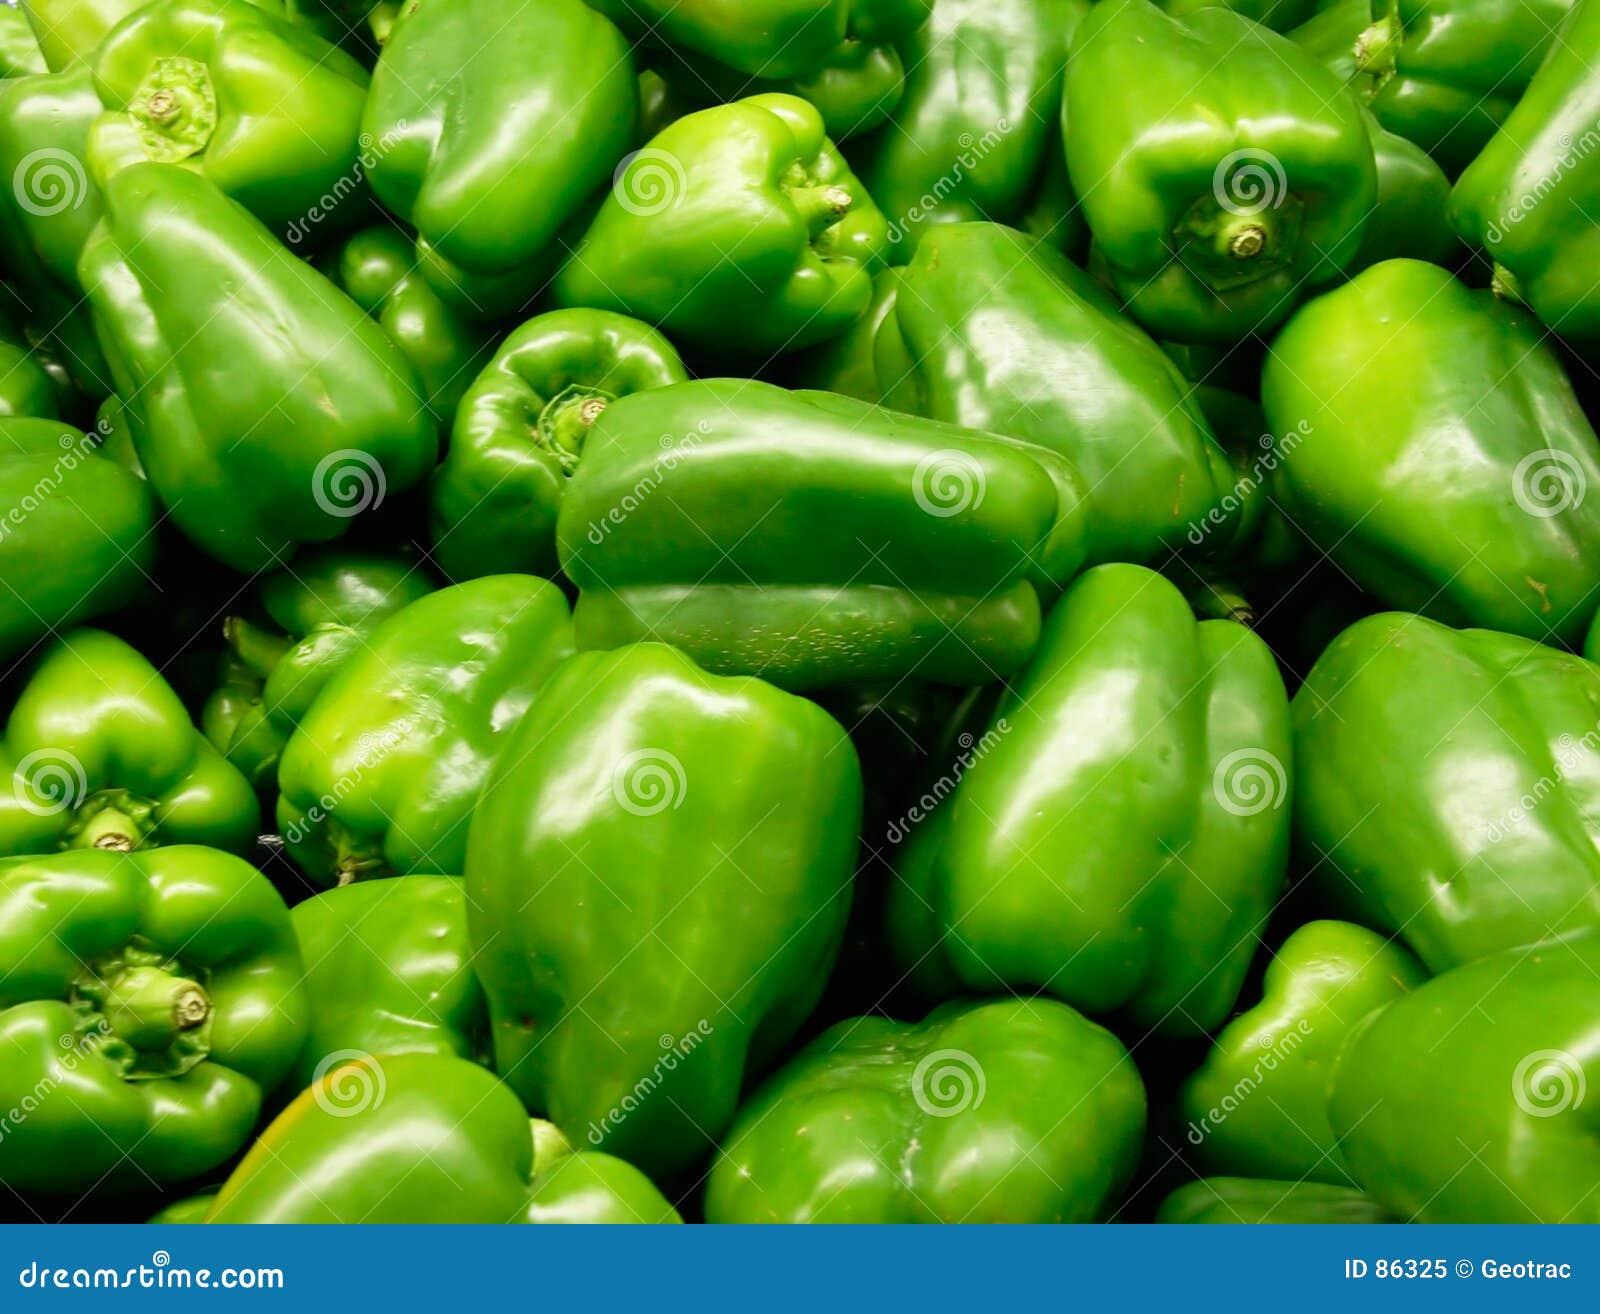 Pimentas verdes